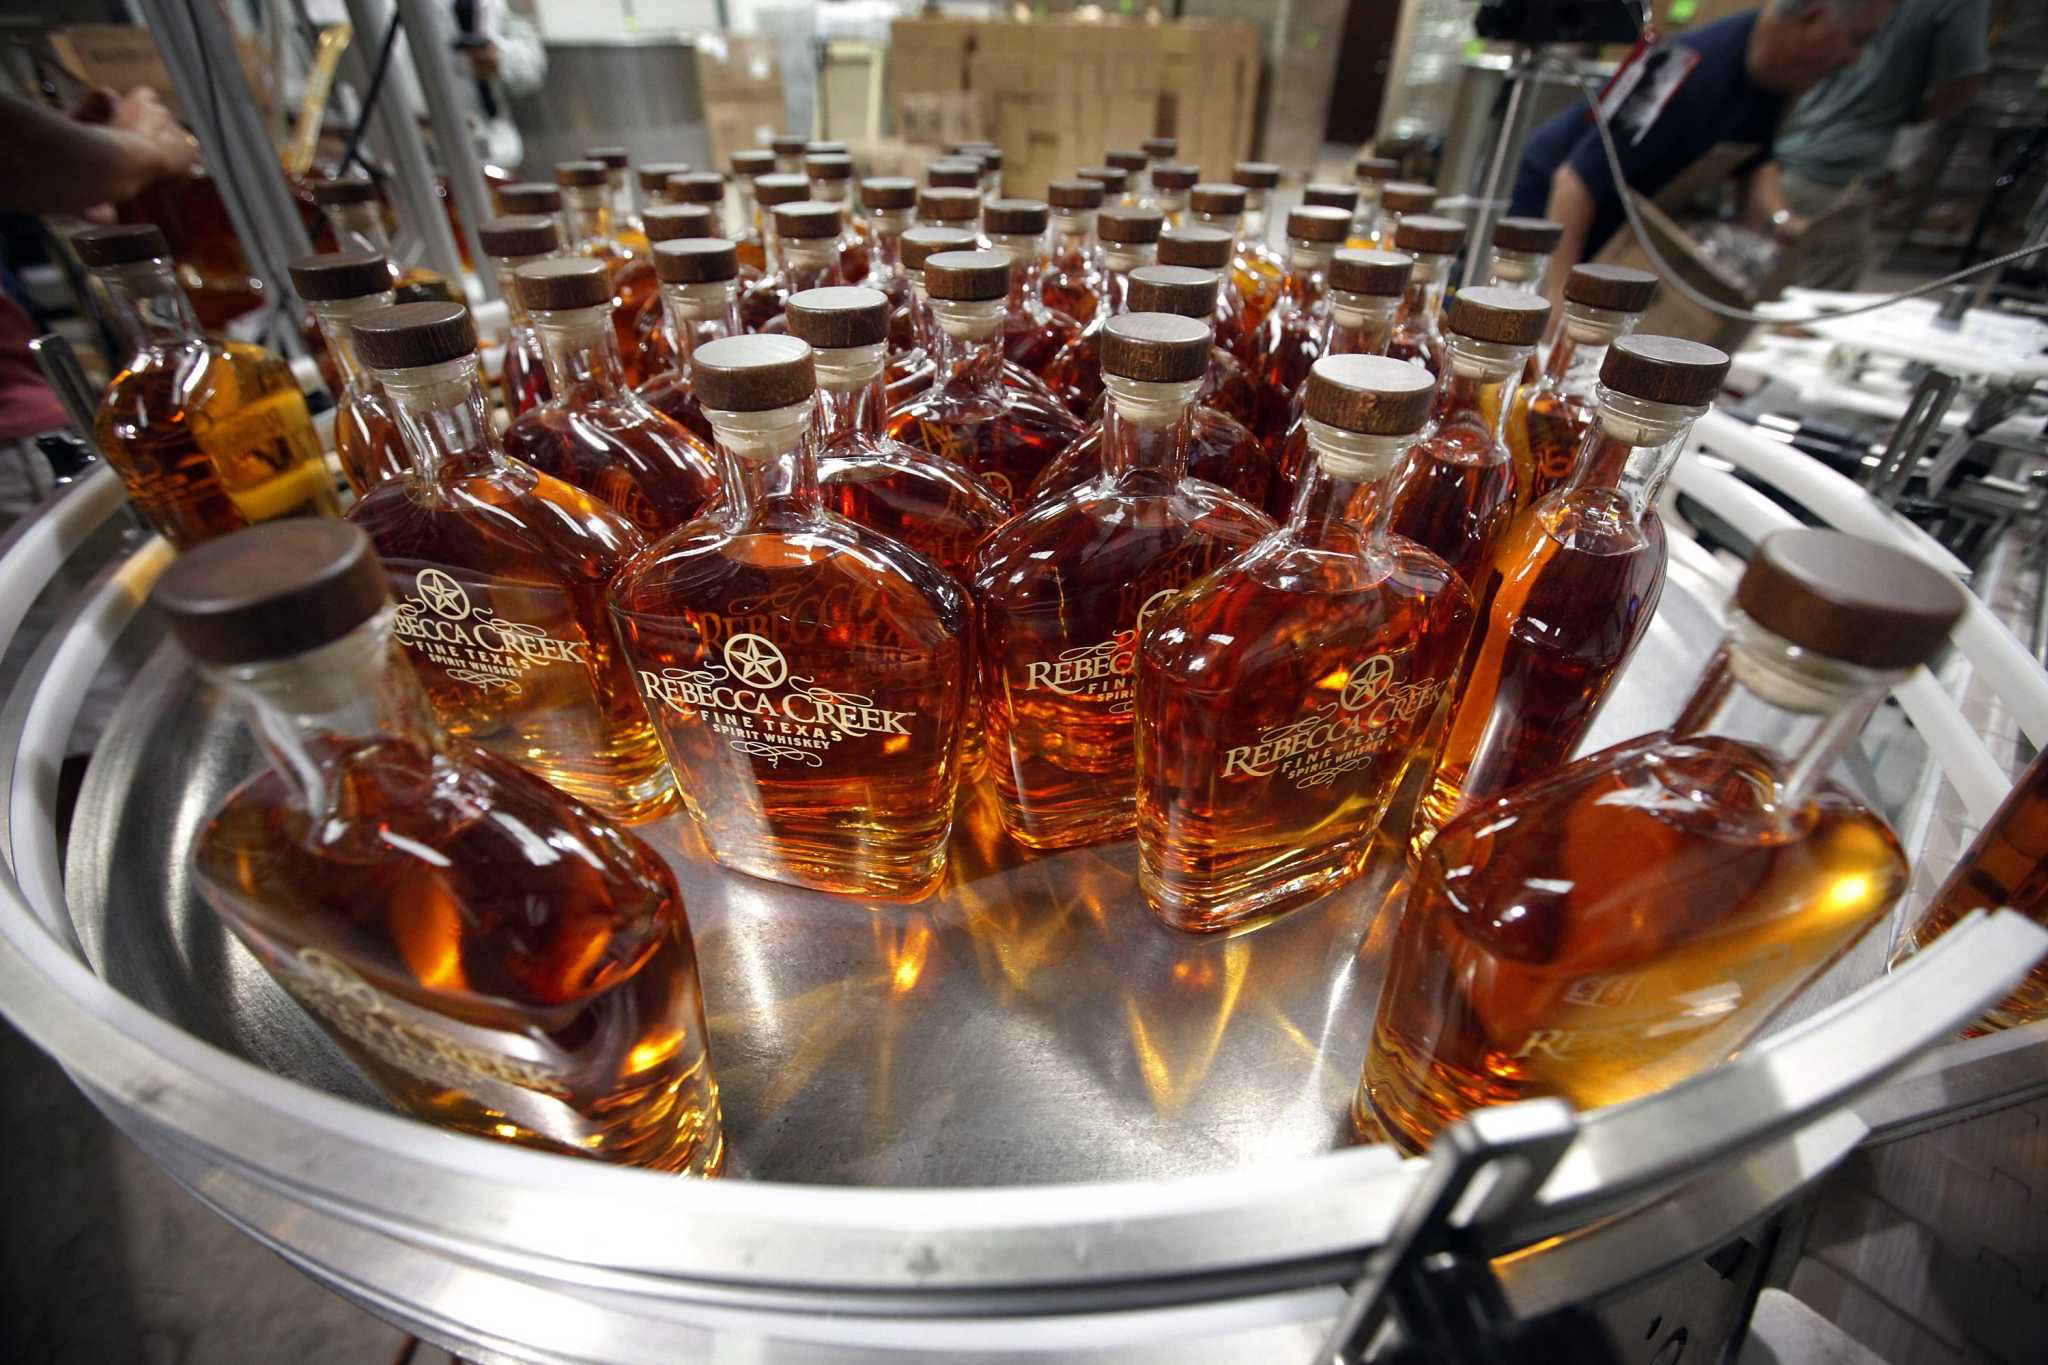 Rebecca Creek Distillery - San Antonio Express-News